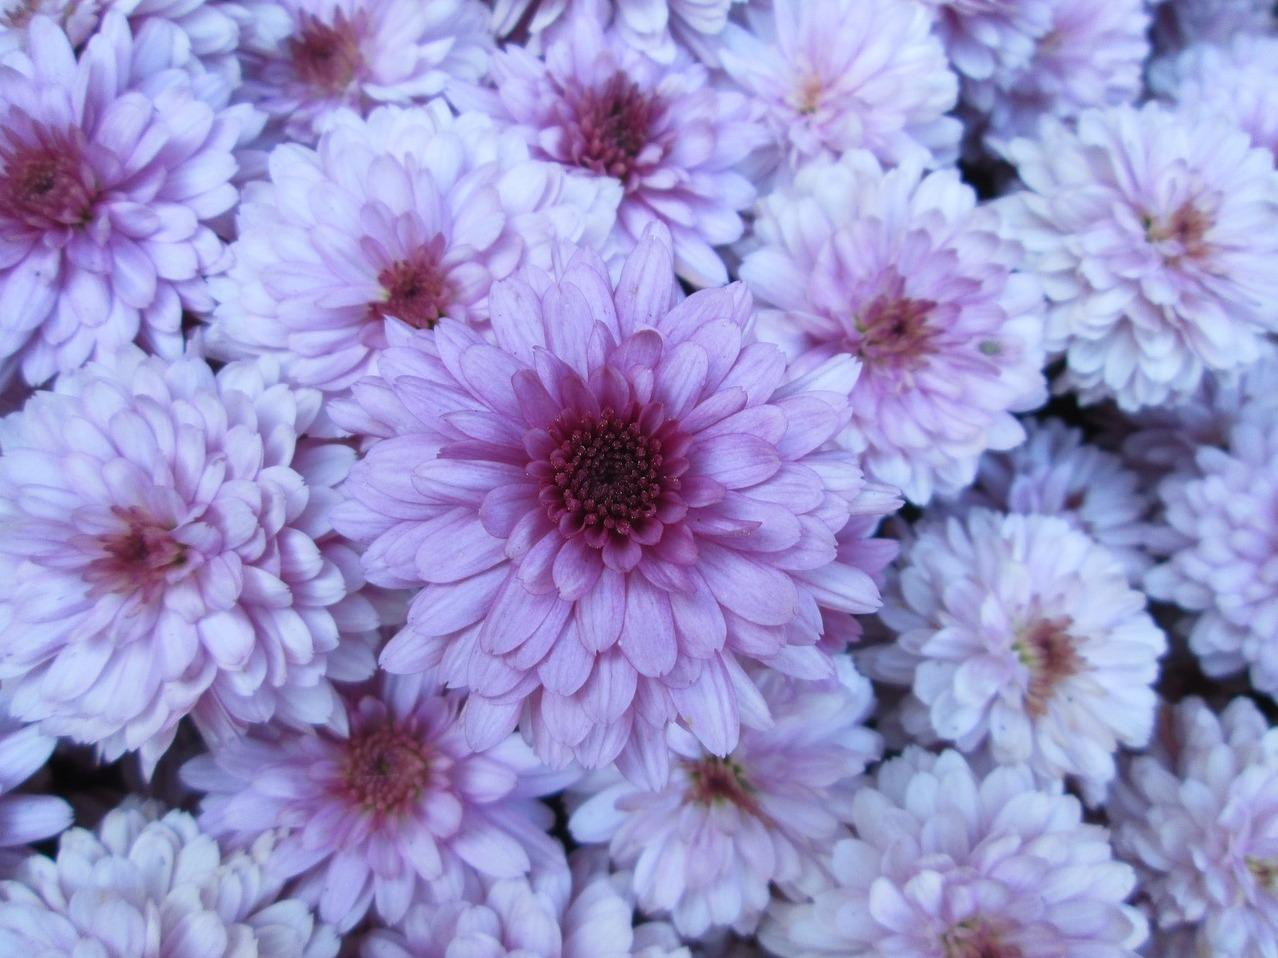 MaxPixel.freegreatpicture.com-Garden-Chrysanthemum-Cluster-Flower-Purple-White-557750.jpg